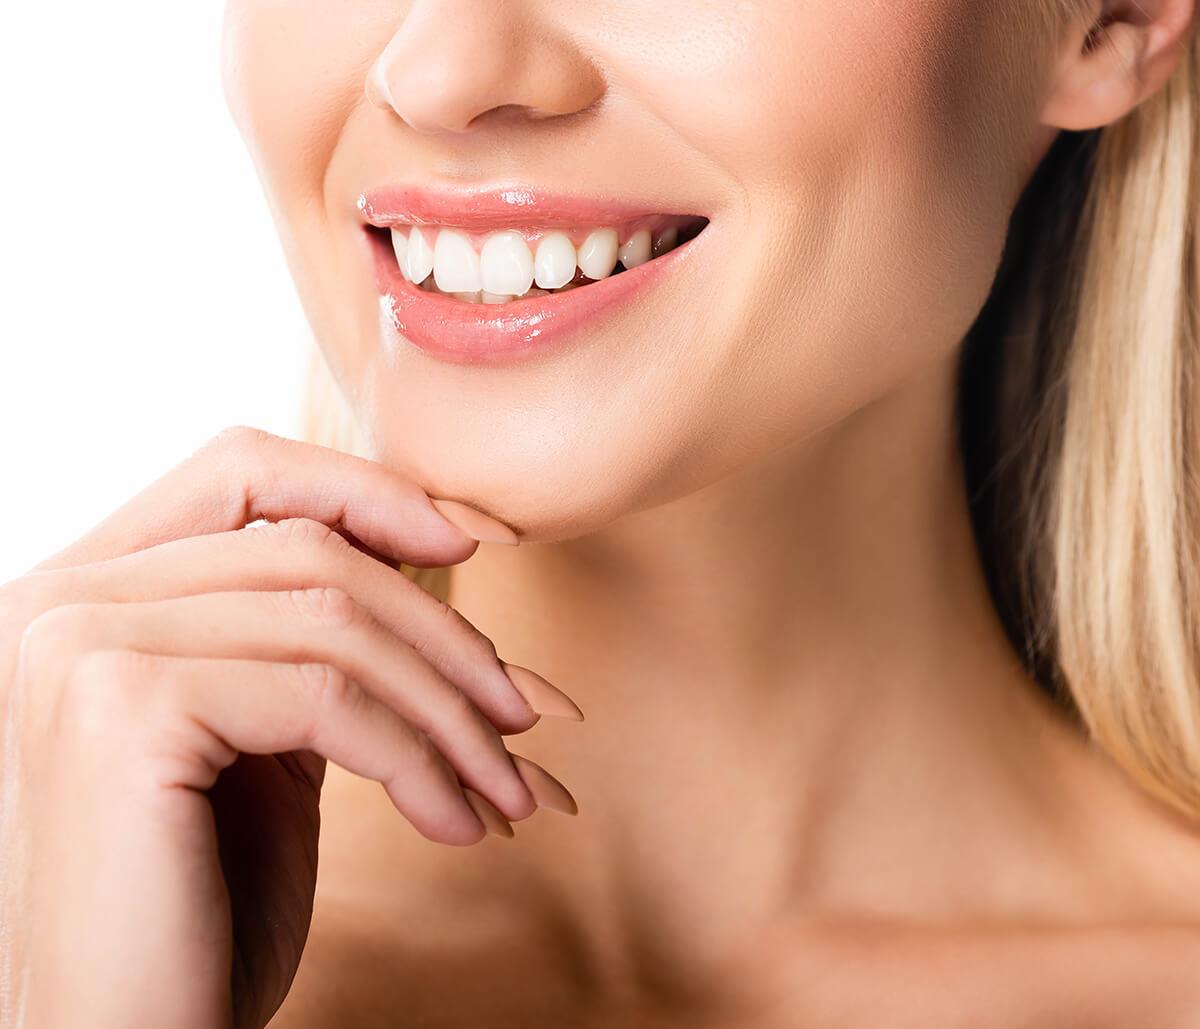 Teeth Whitening Dentist at Pines Dental Associates in Pembroke Pines FL Area